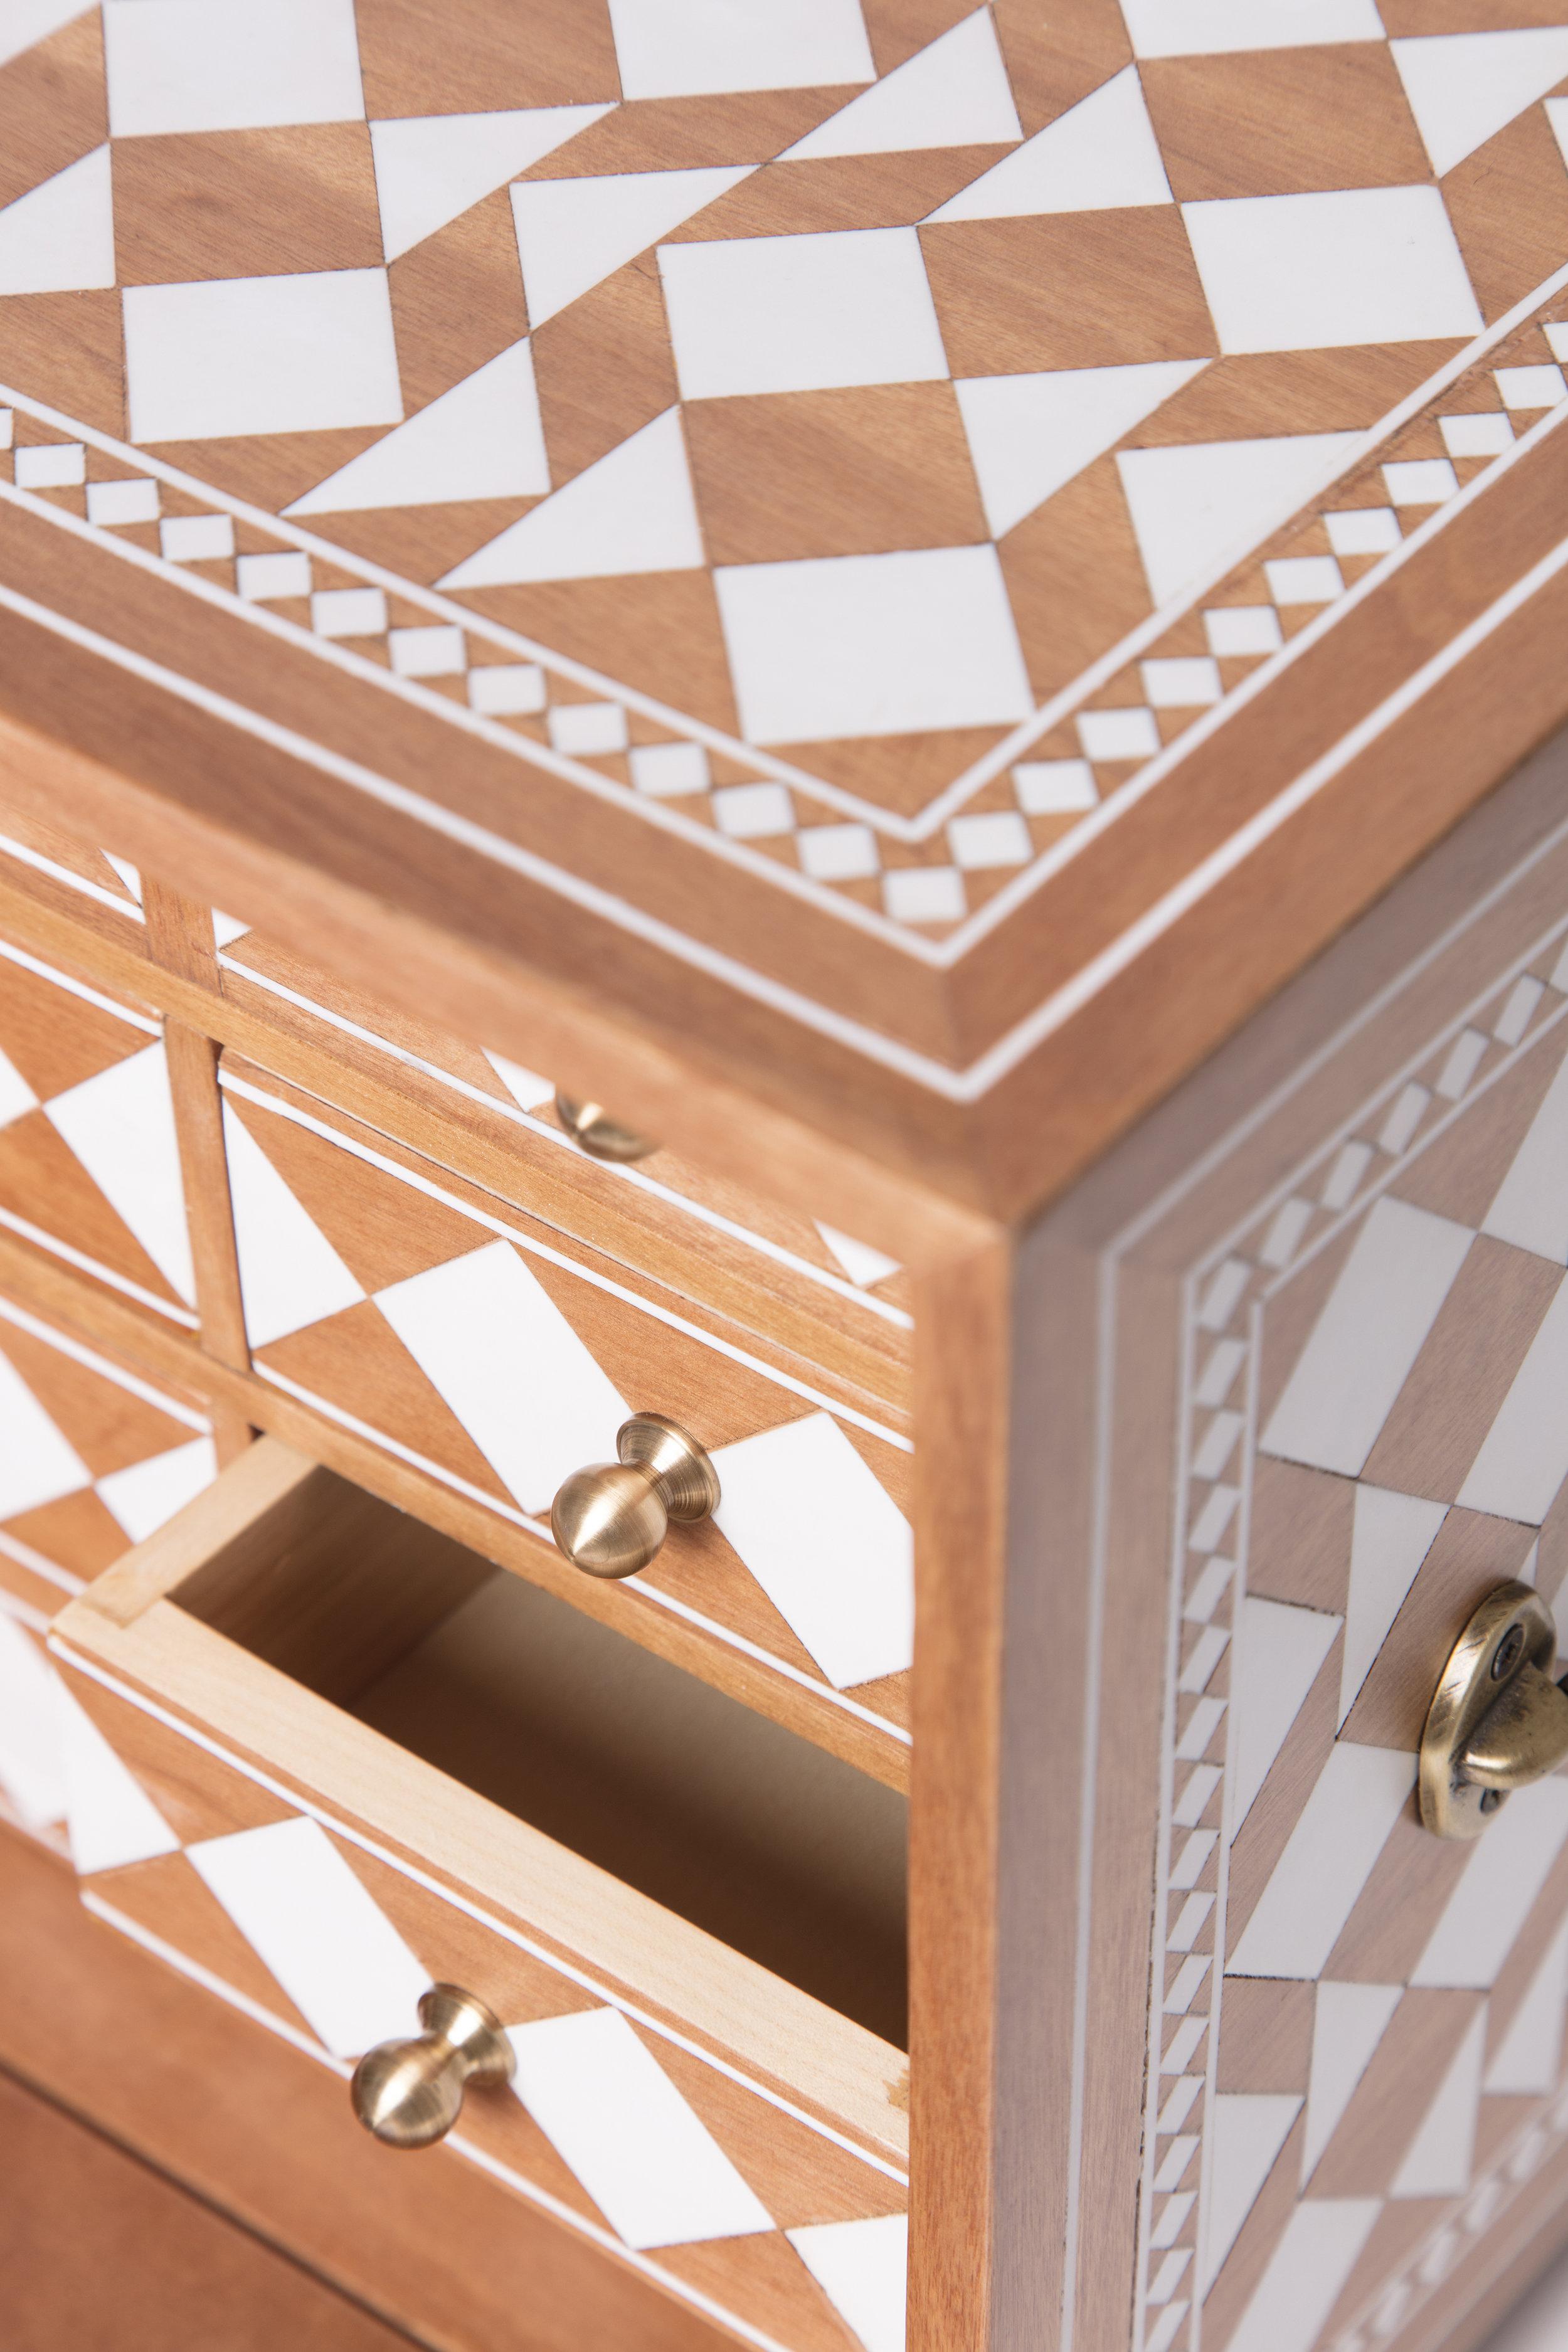 Sibylle Tarazi_Curiosity Cabinets_One and a half_Detail 2_2017.jpg